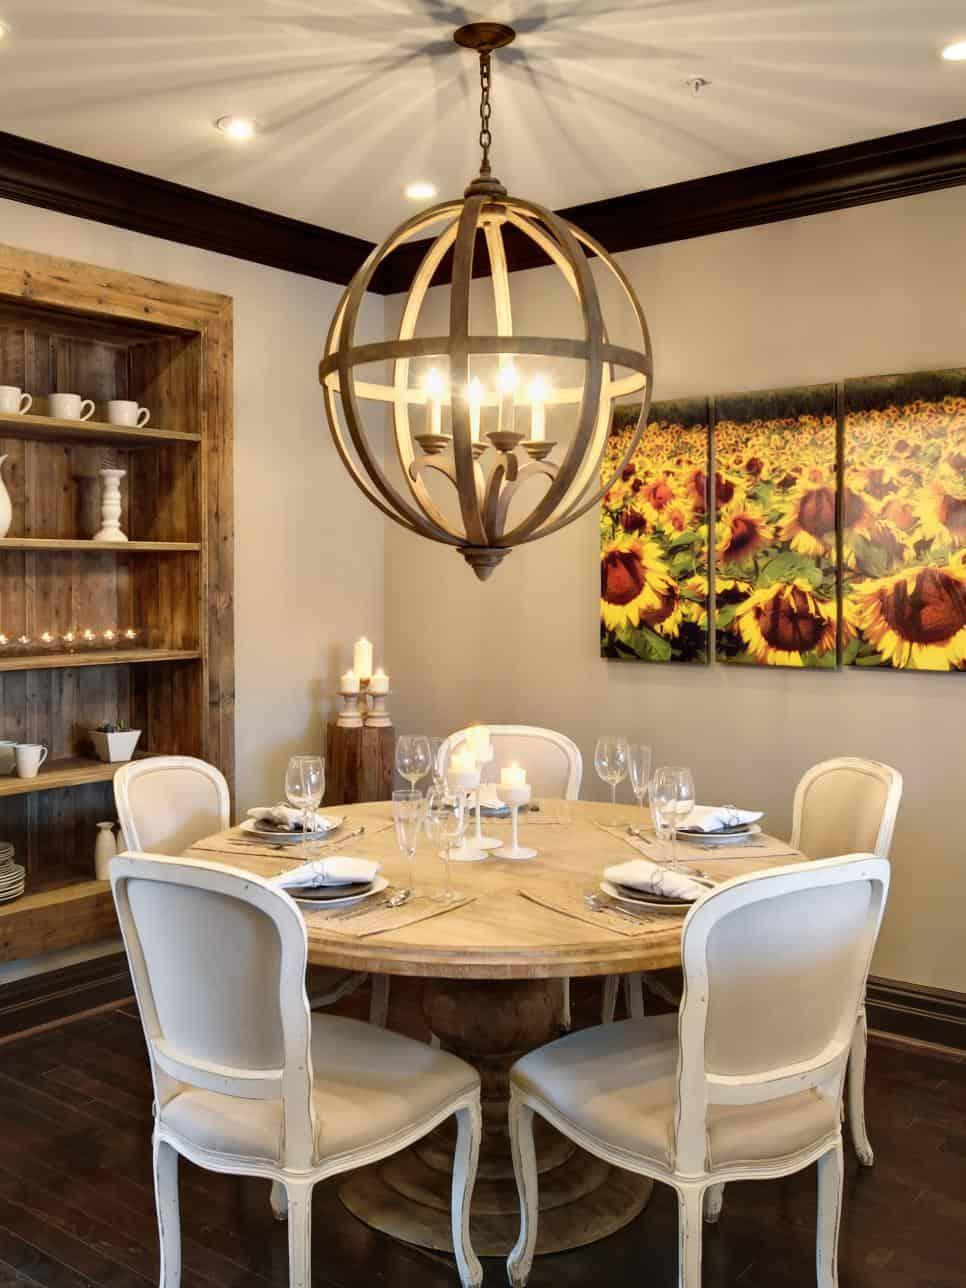 captivating dining room lighting | Dining Room Lighting Trends for 2019